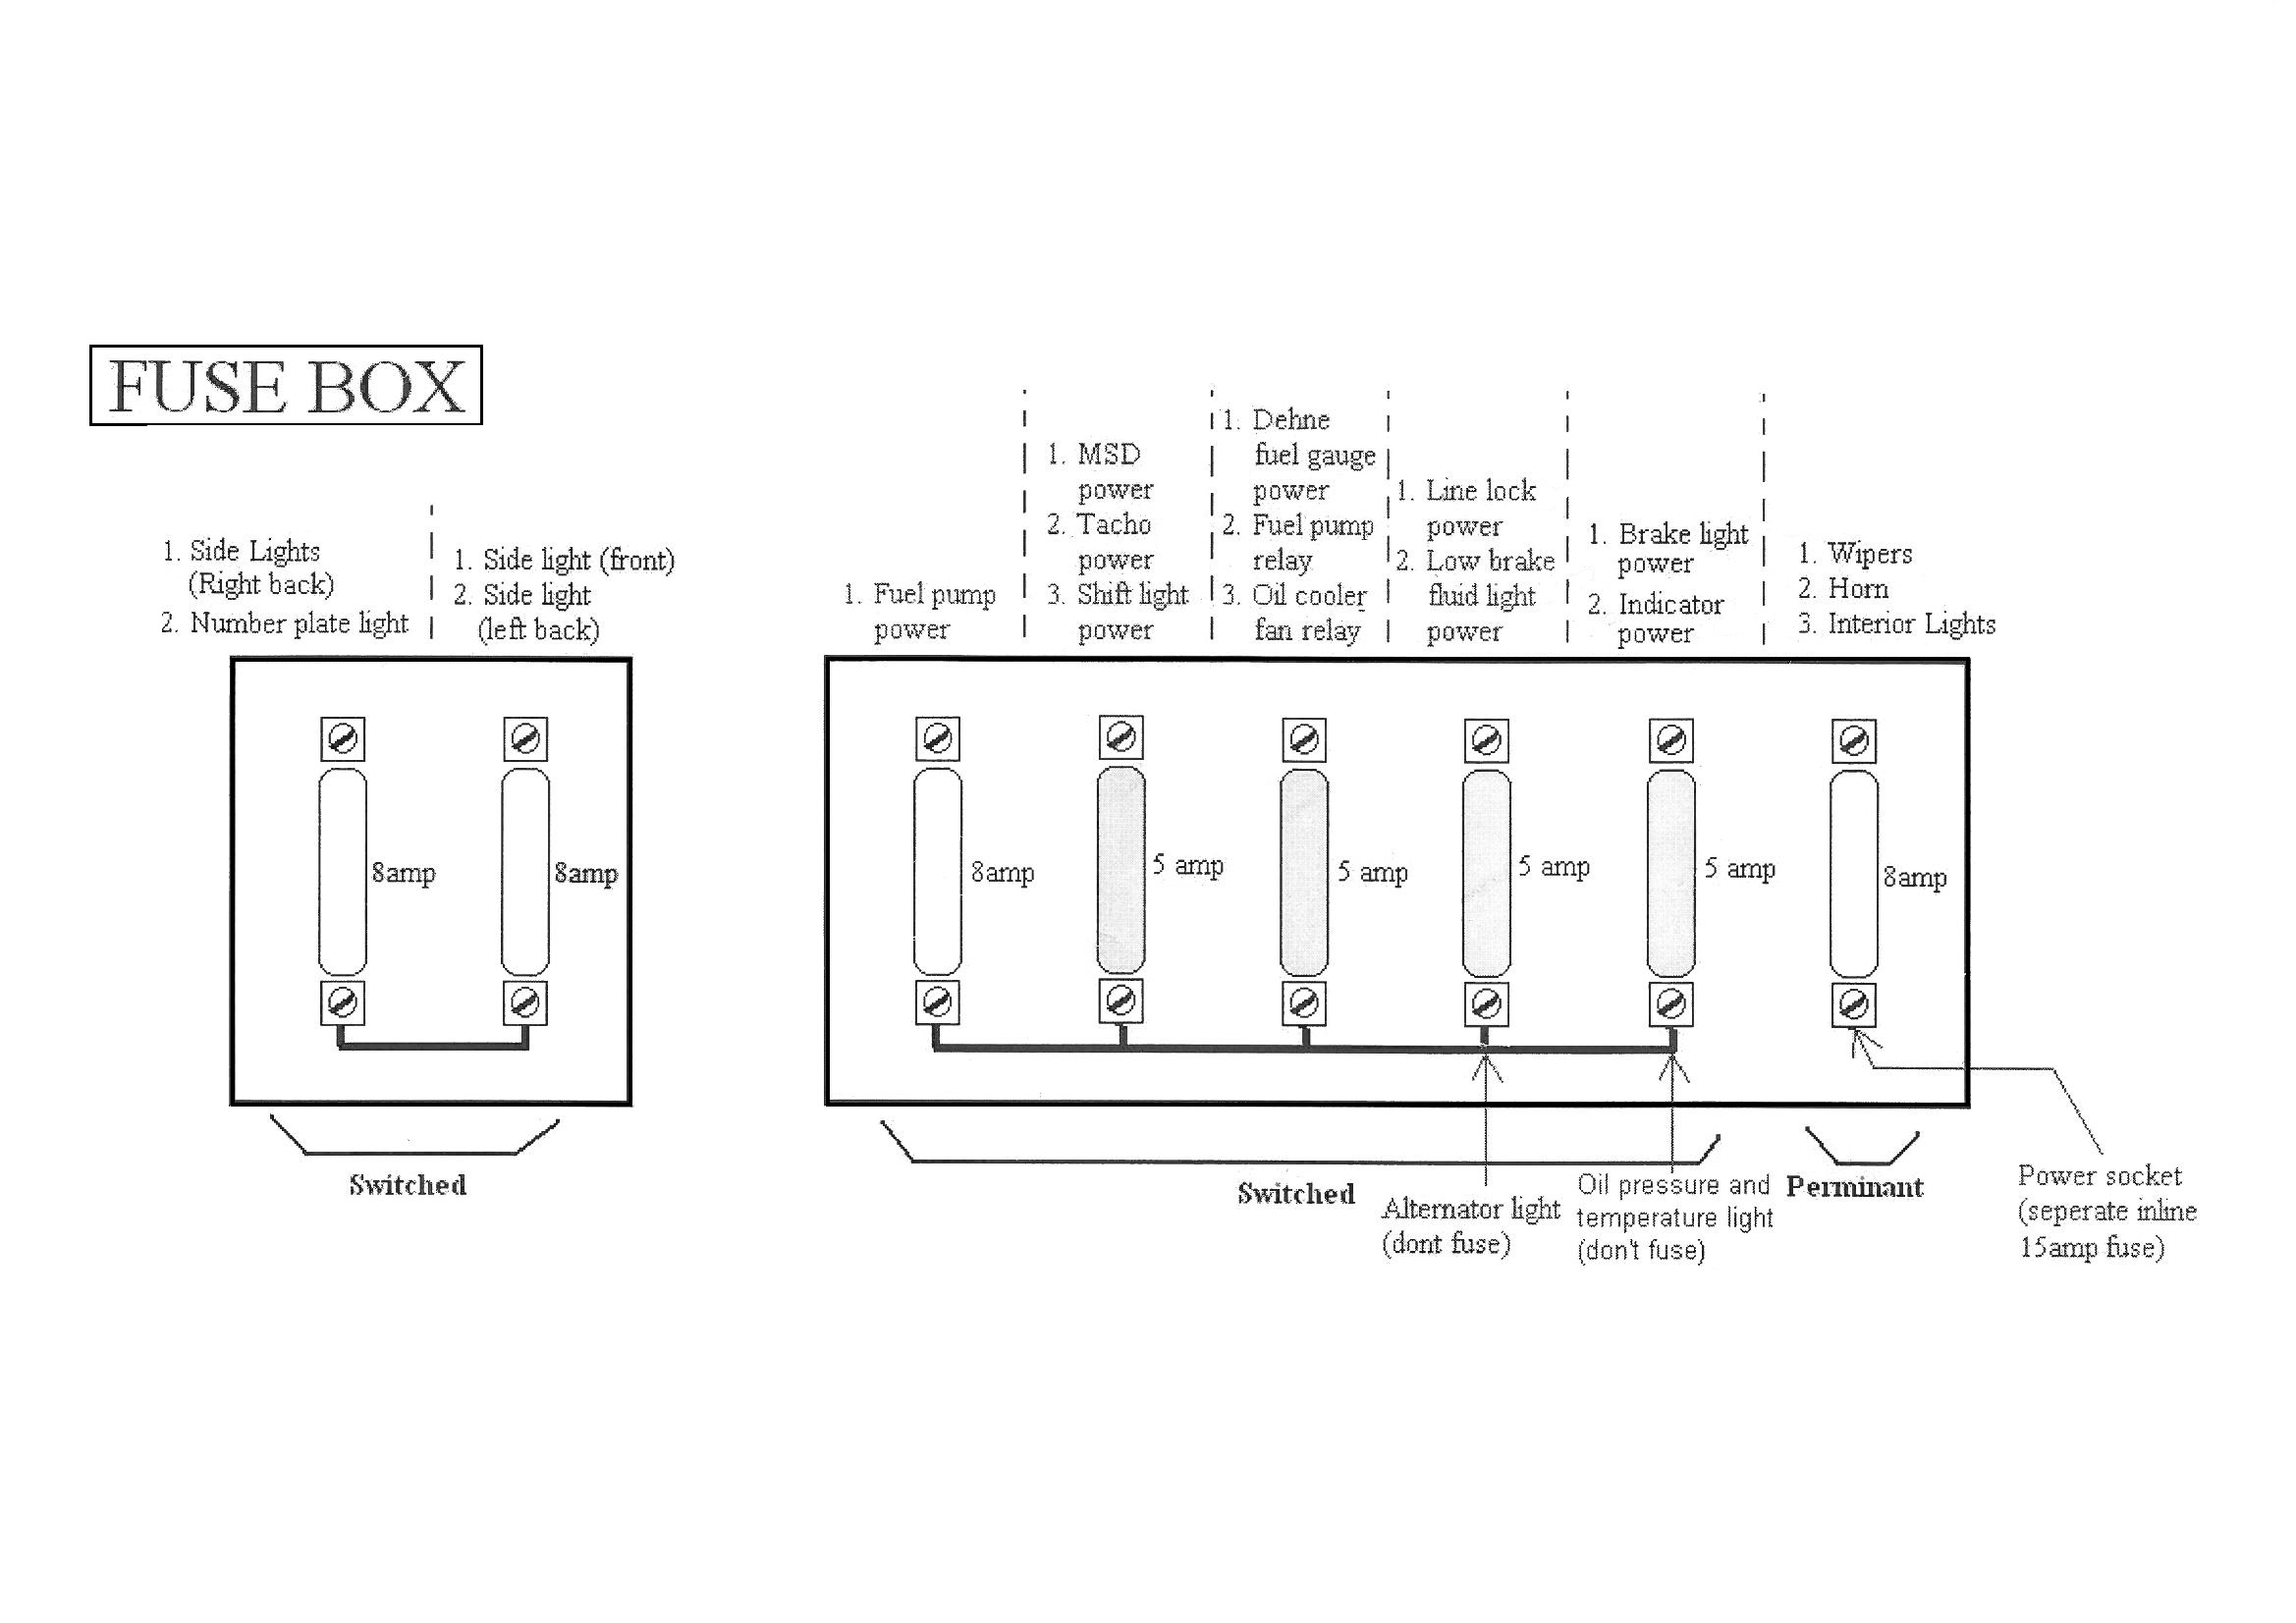 fusebox?resize\\\=665%2C470 code 3 360hl wiring diagram code3 \u2022 wiring diagrams j squared co  at eliteediting.co